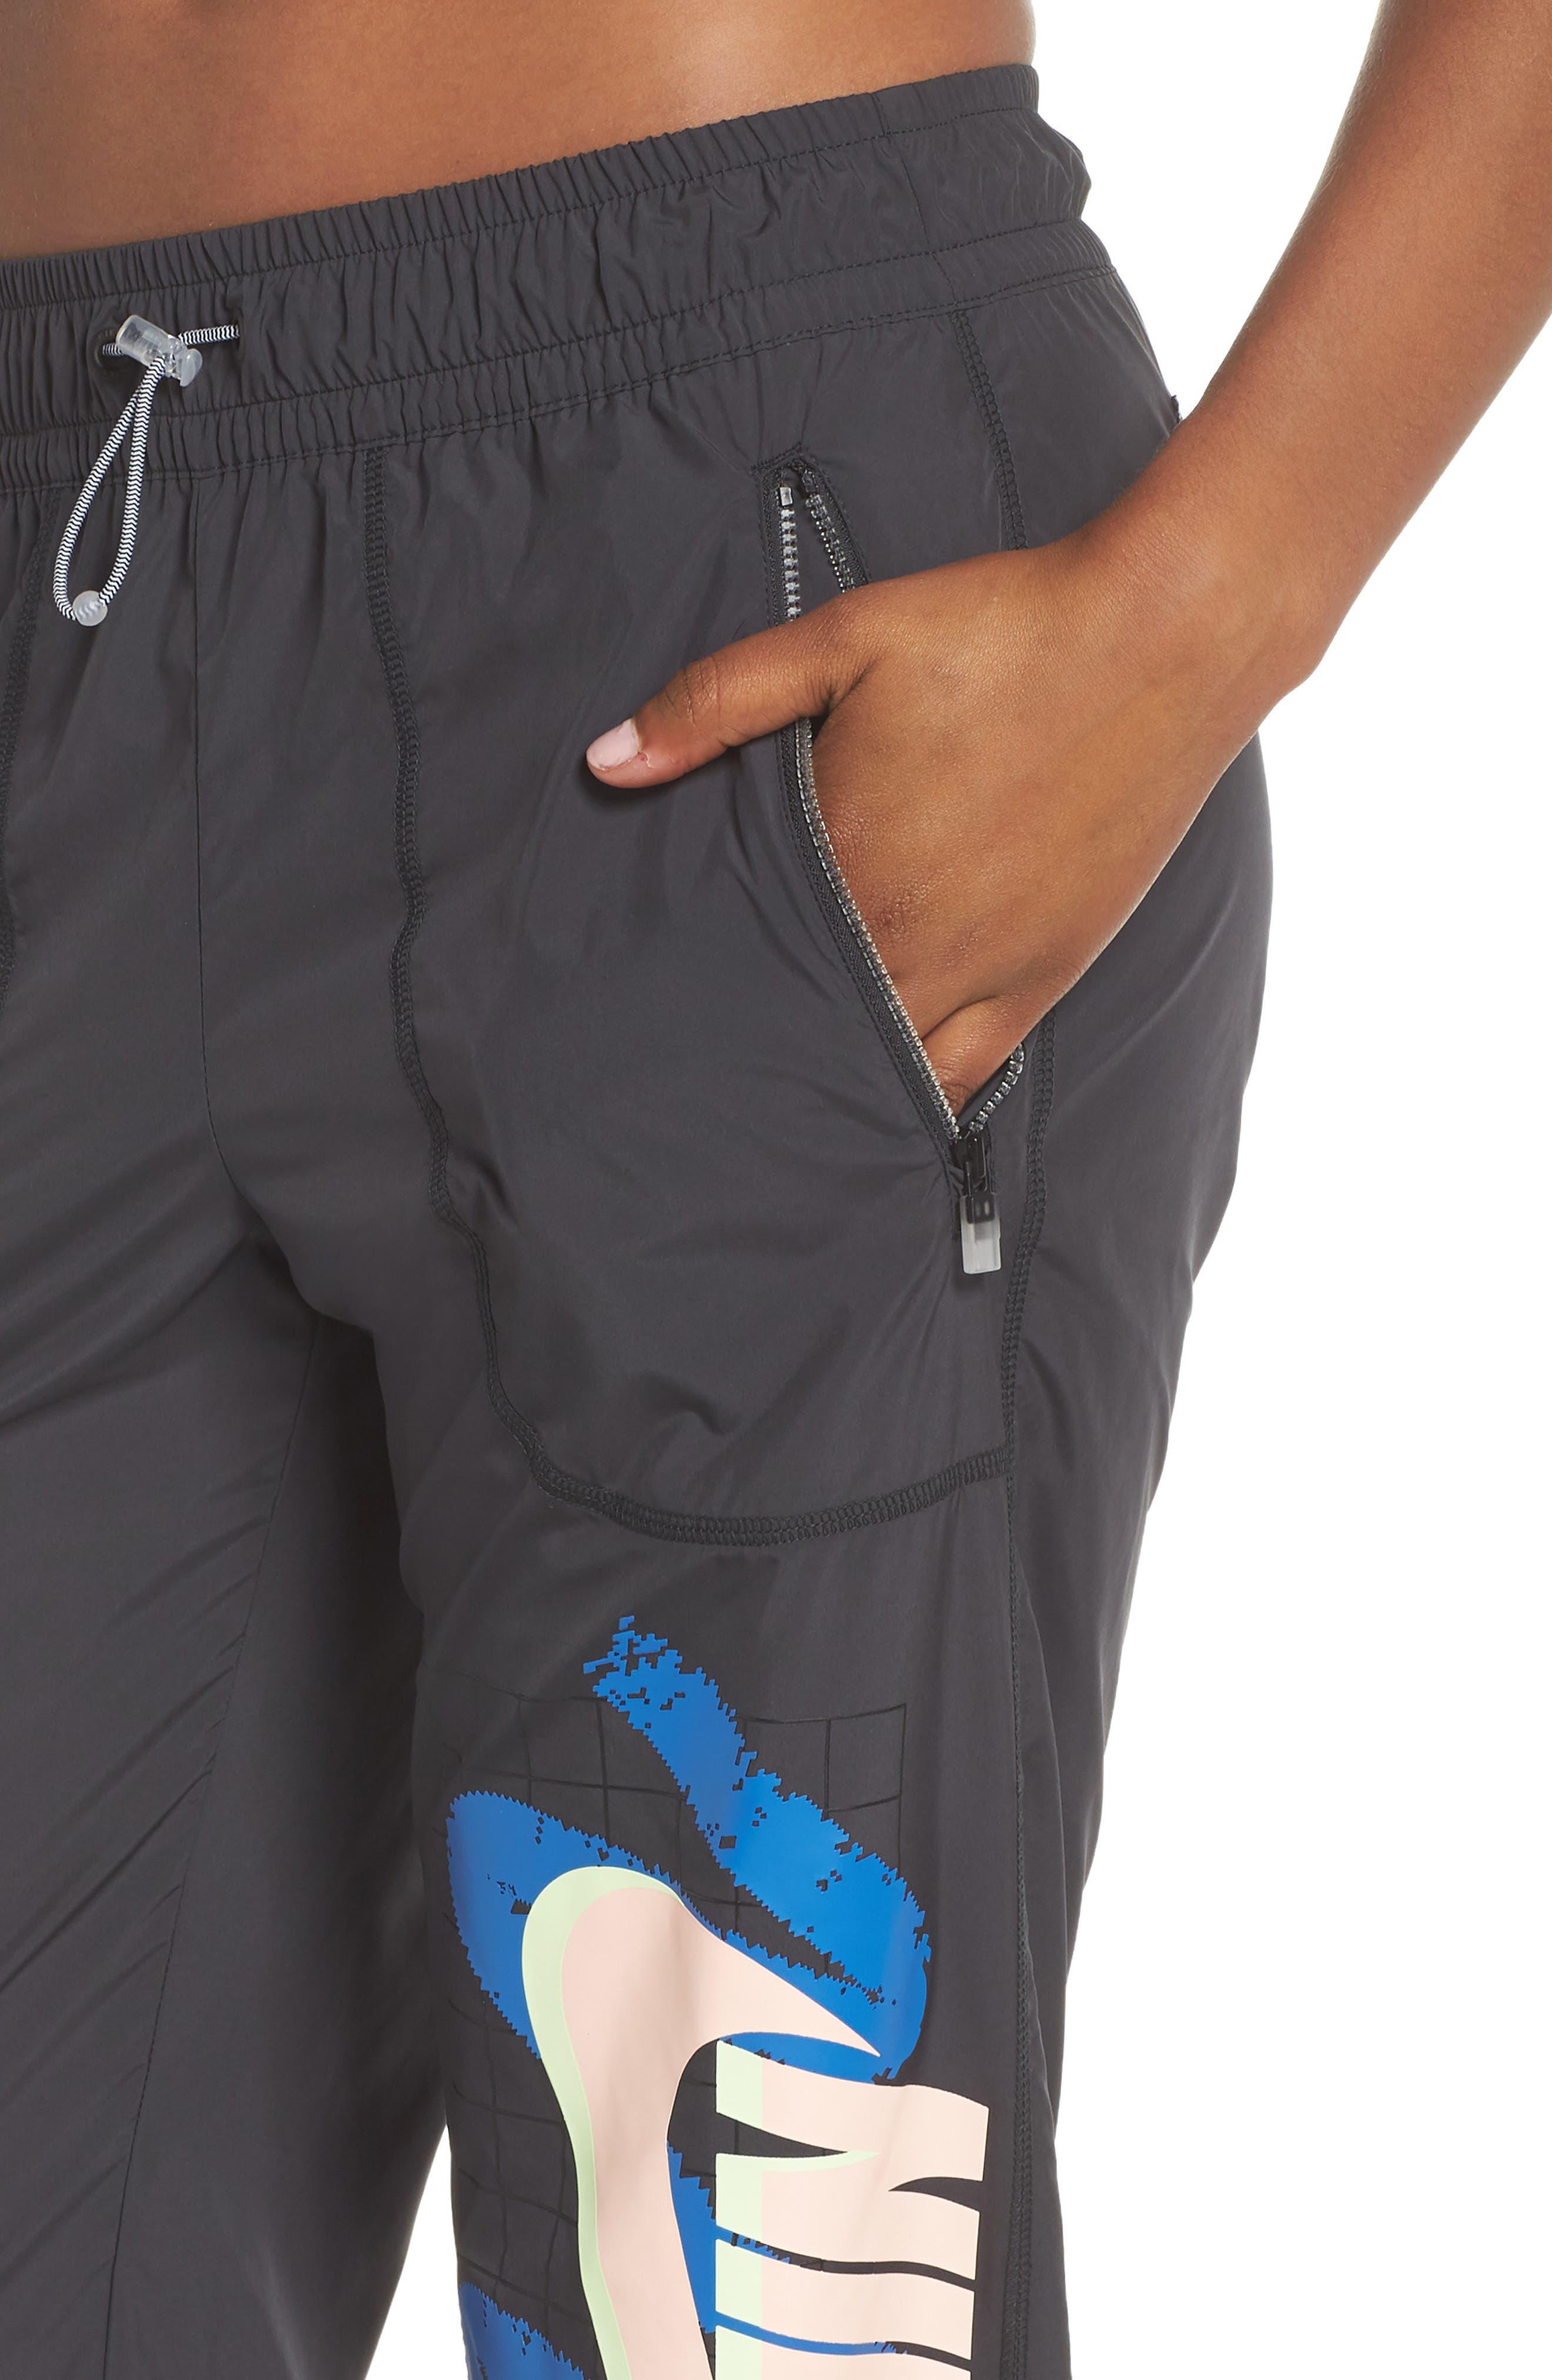 Sportswear Archive Women's Woven Pants,                             Alternate thumbnail 4, color,                             010